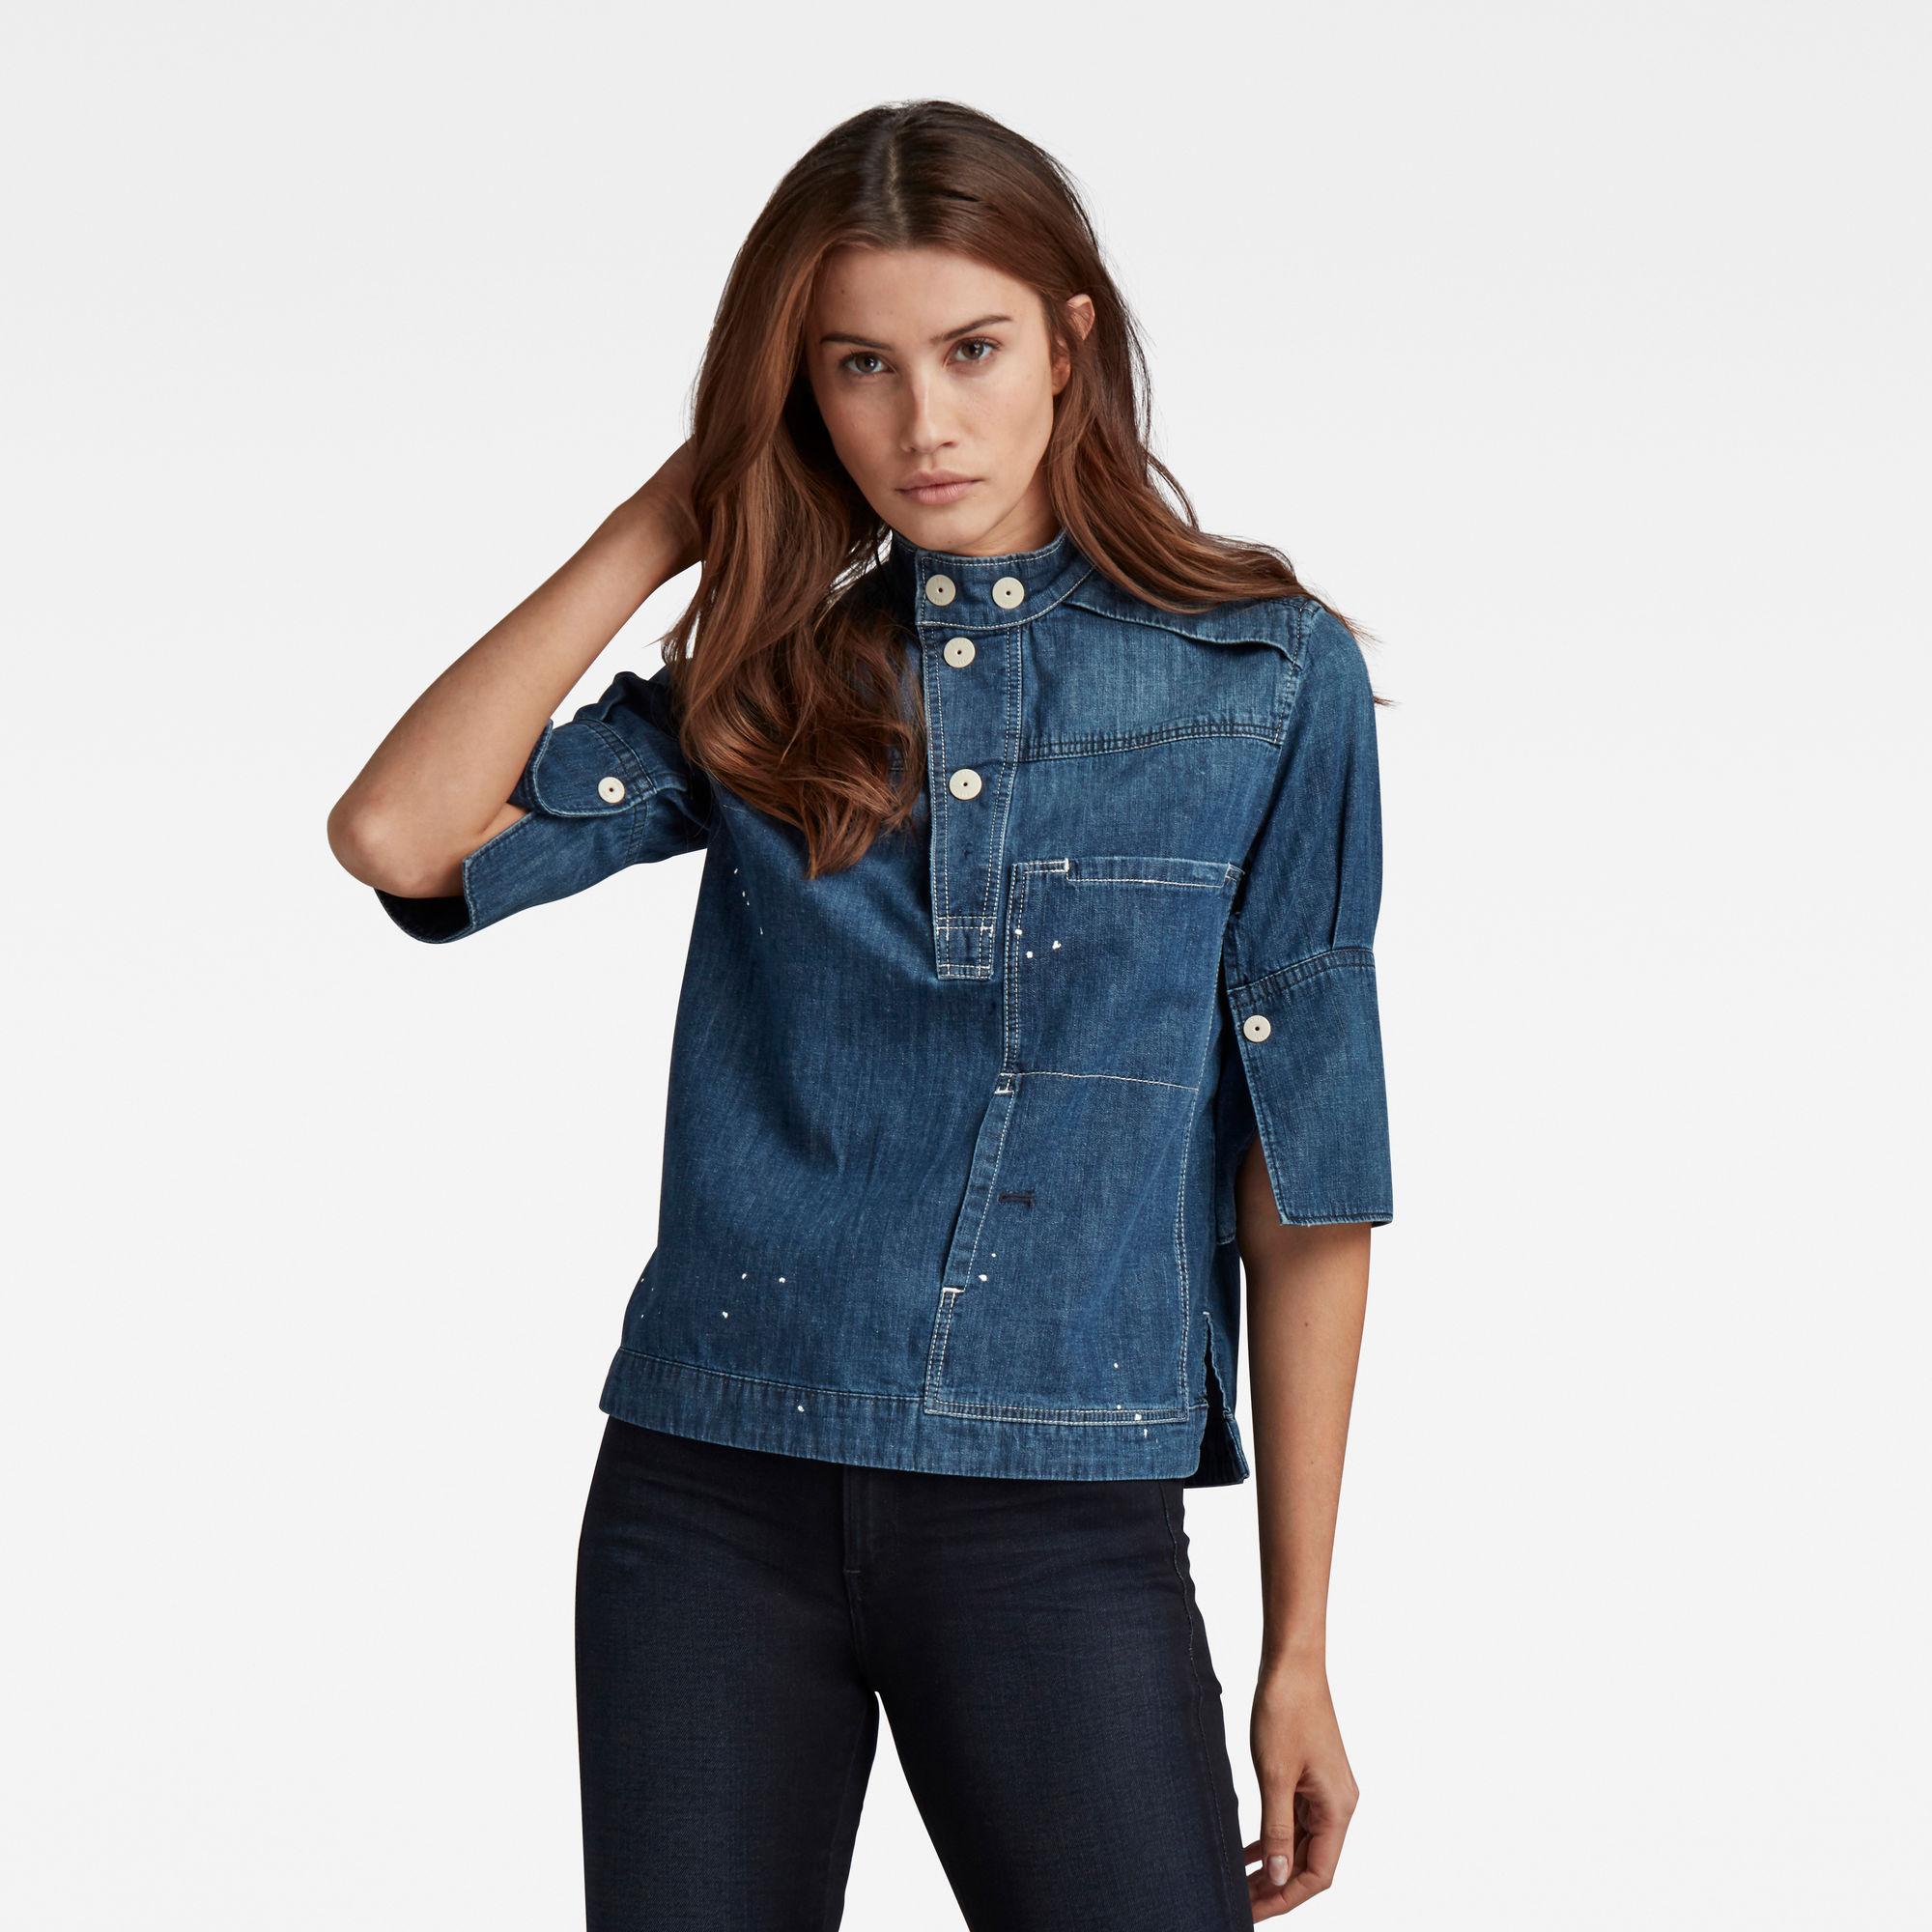 G-Star RAW Dames Workwear Shirt Blauw